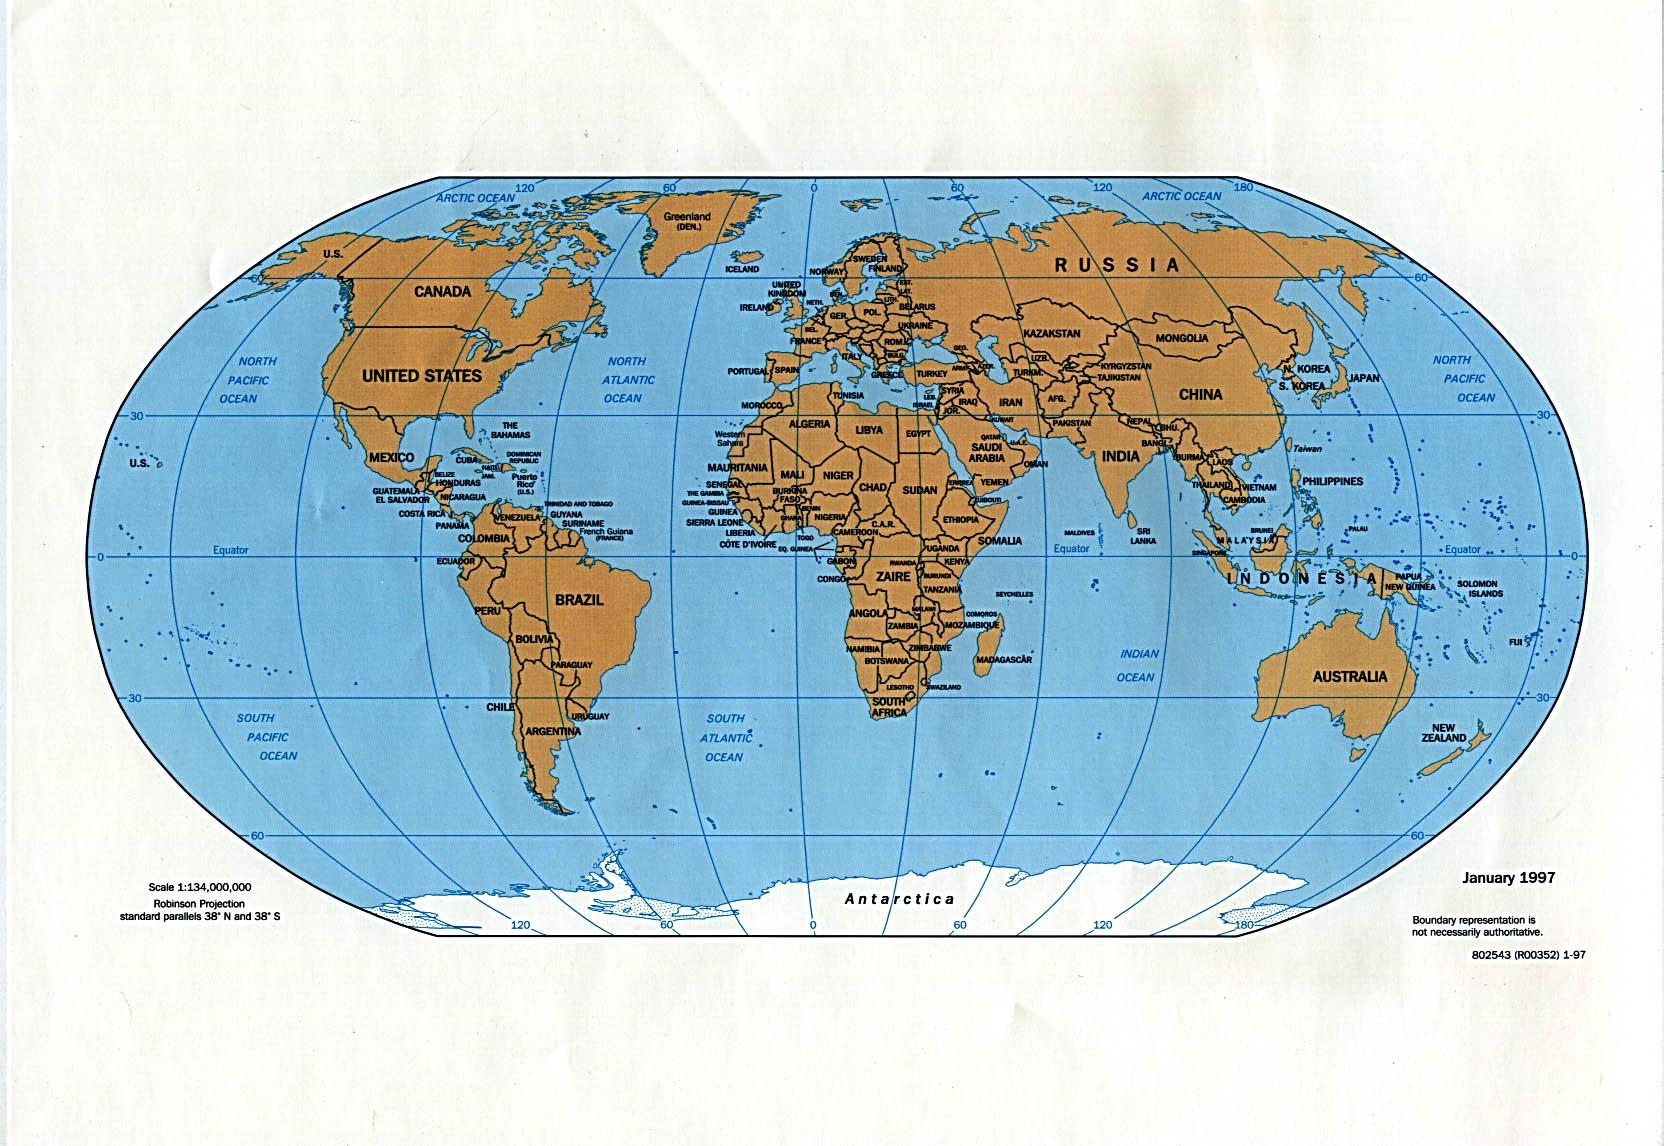 World political map 1997 Full size